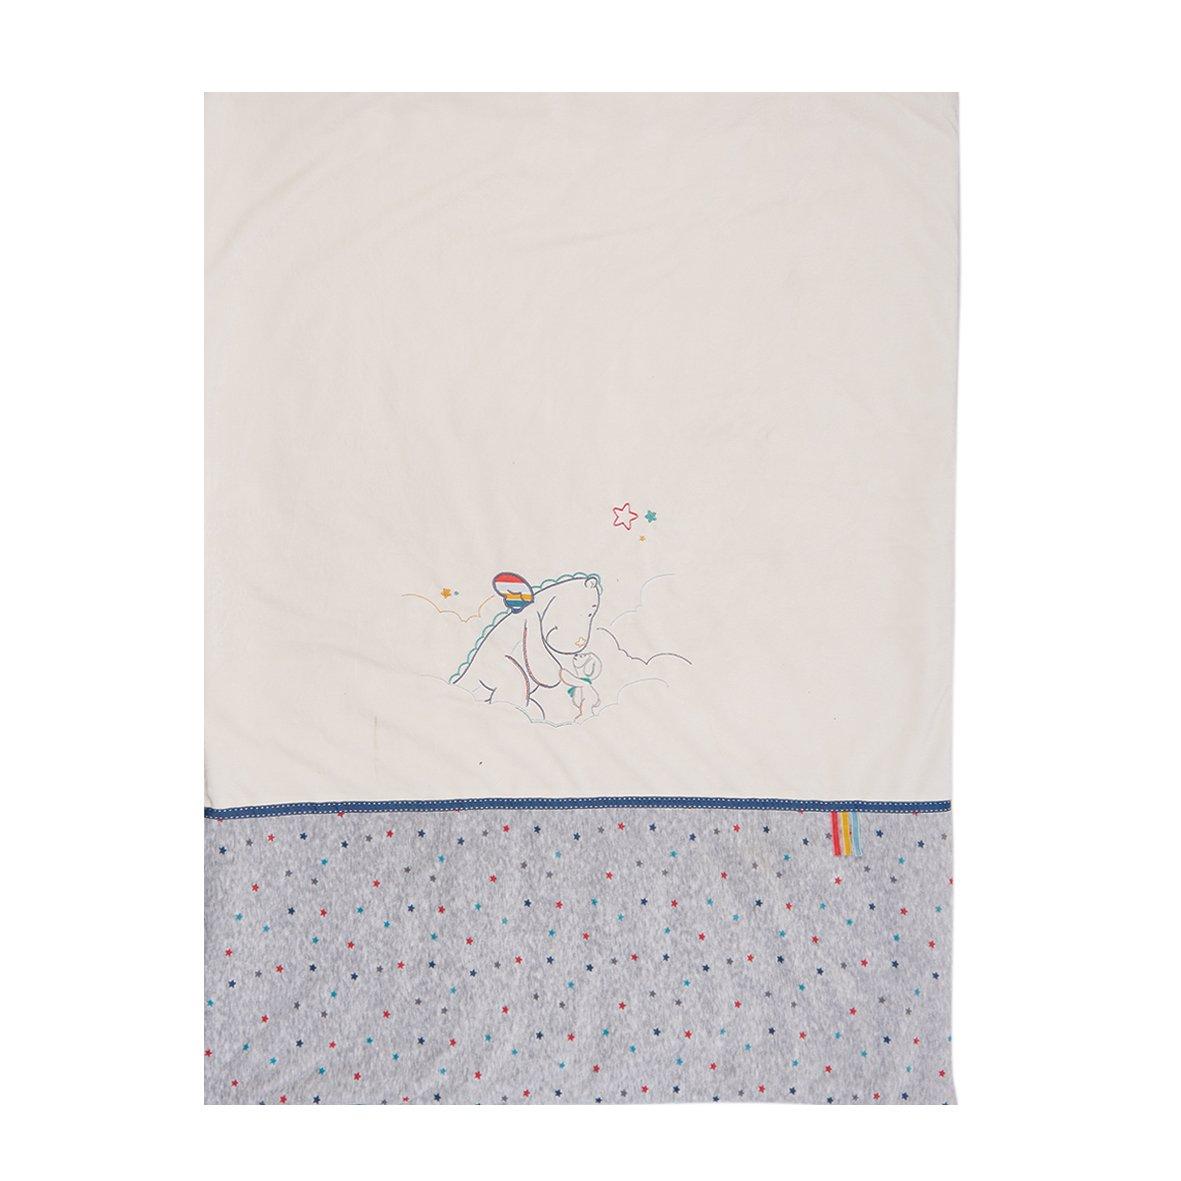 Noukies BB1610.42 Guss & Victor Veloudoux Decke, 75 x 100 cm, weiß